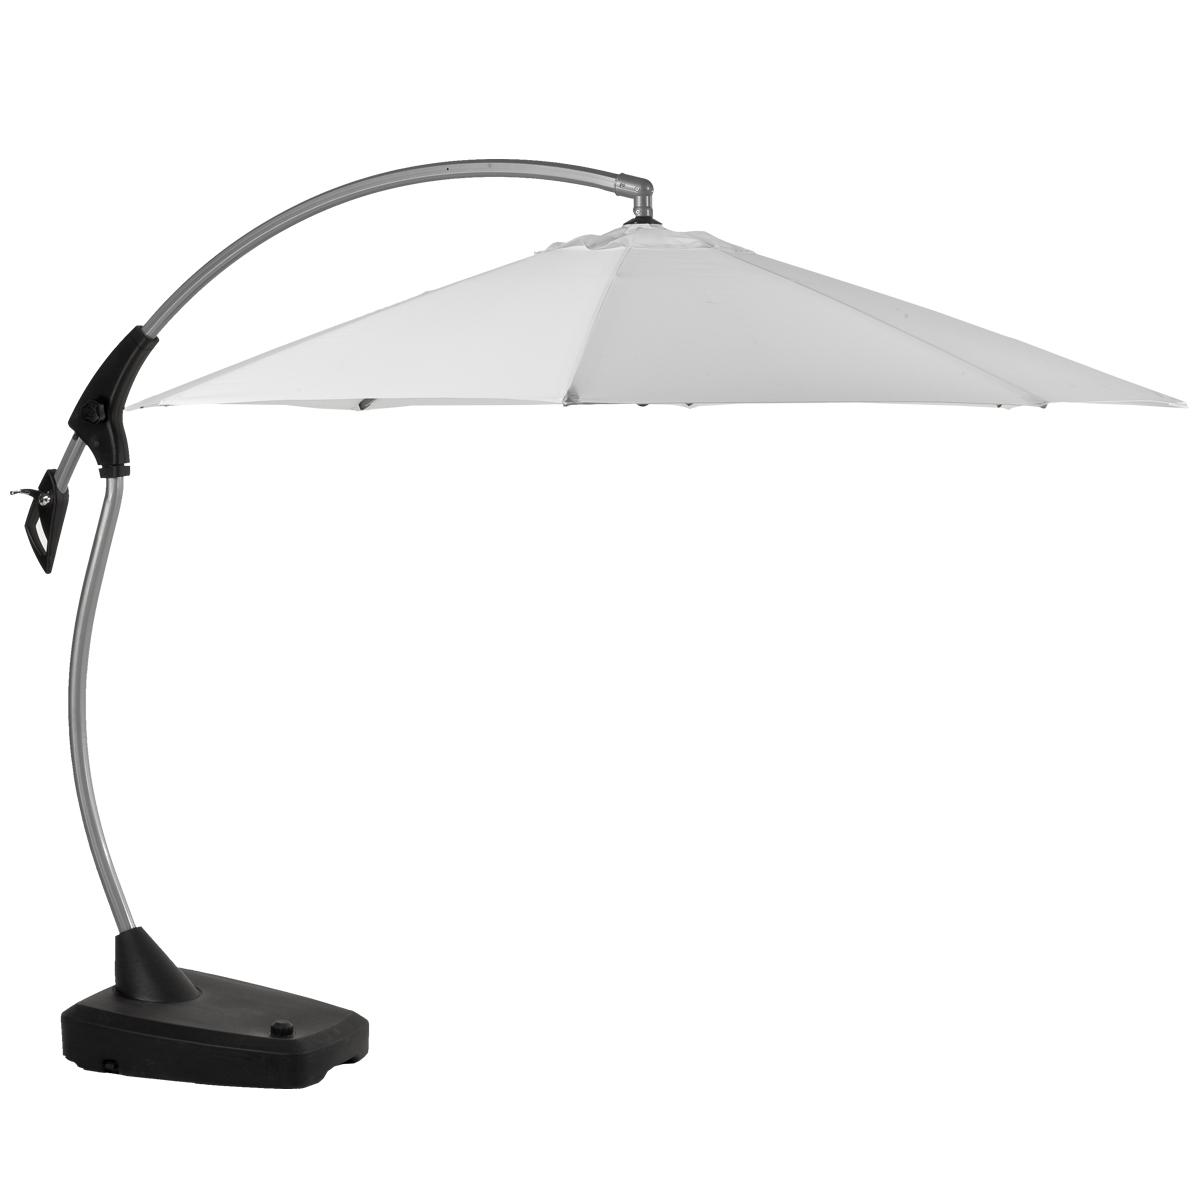 parasol d port en aluminium amalfi toile blanche diam tre 3m jardin acheter ce produit. Black Bedroom Furniture Sets. Home Design Ideas